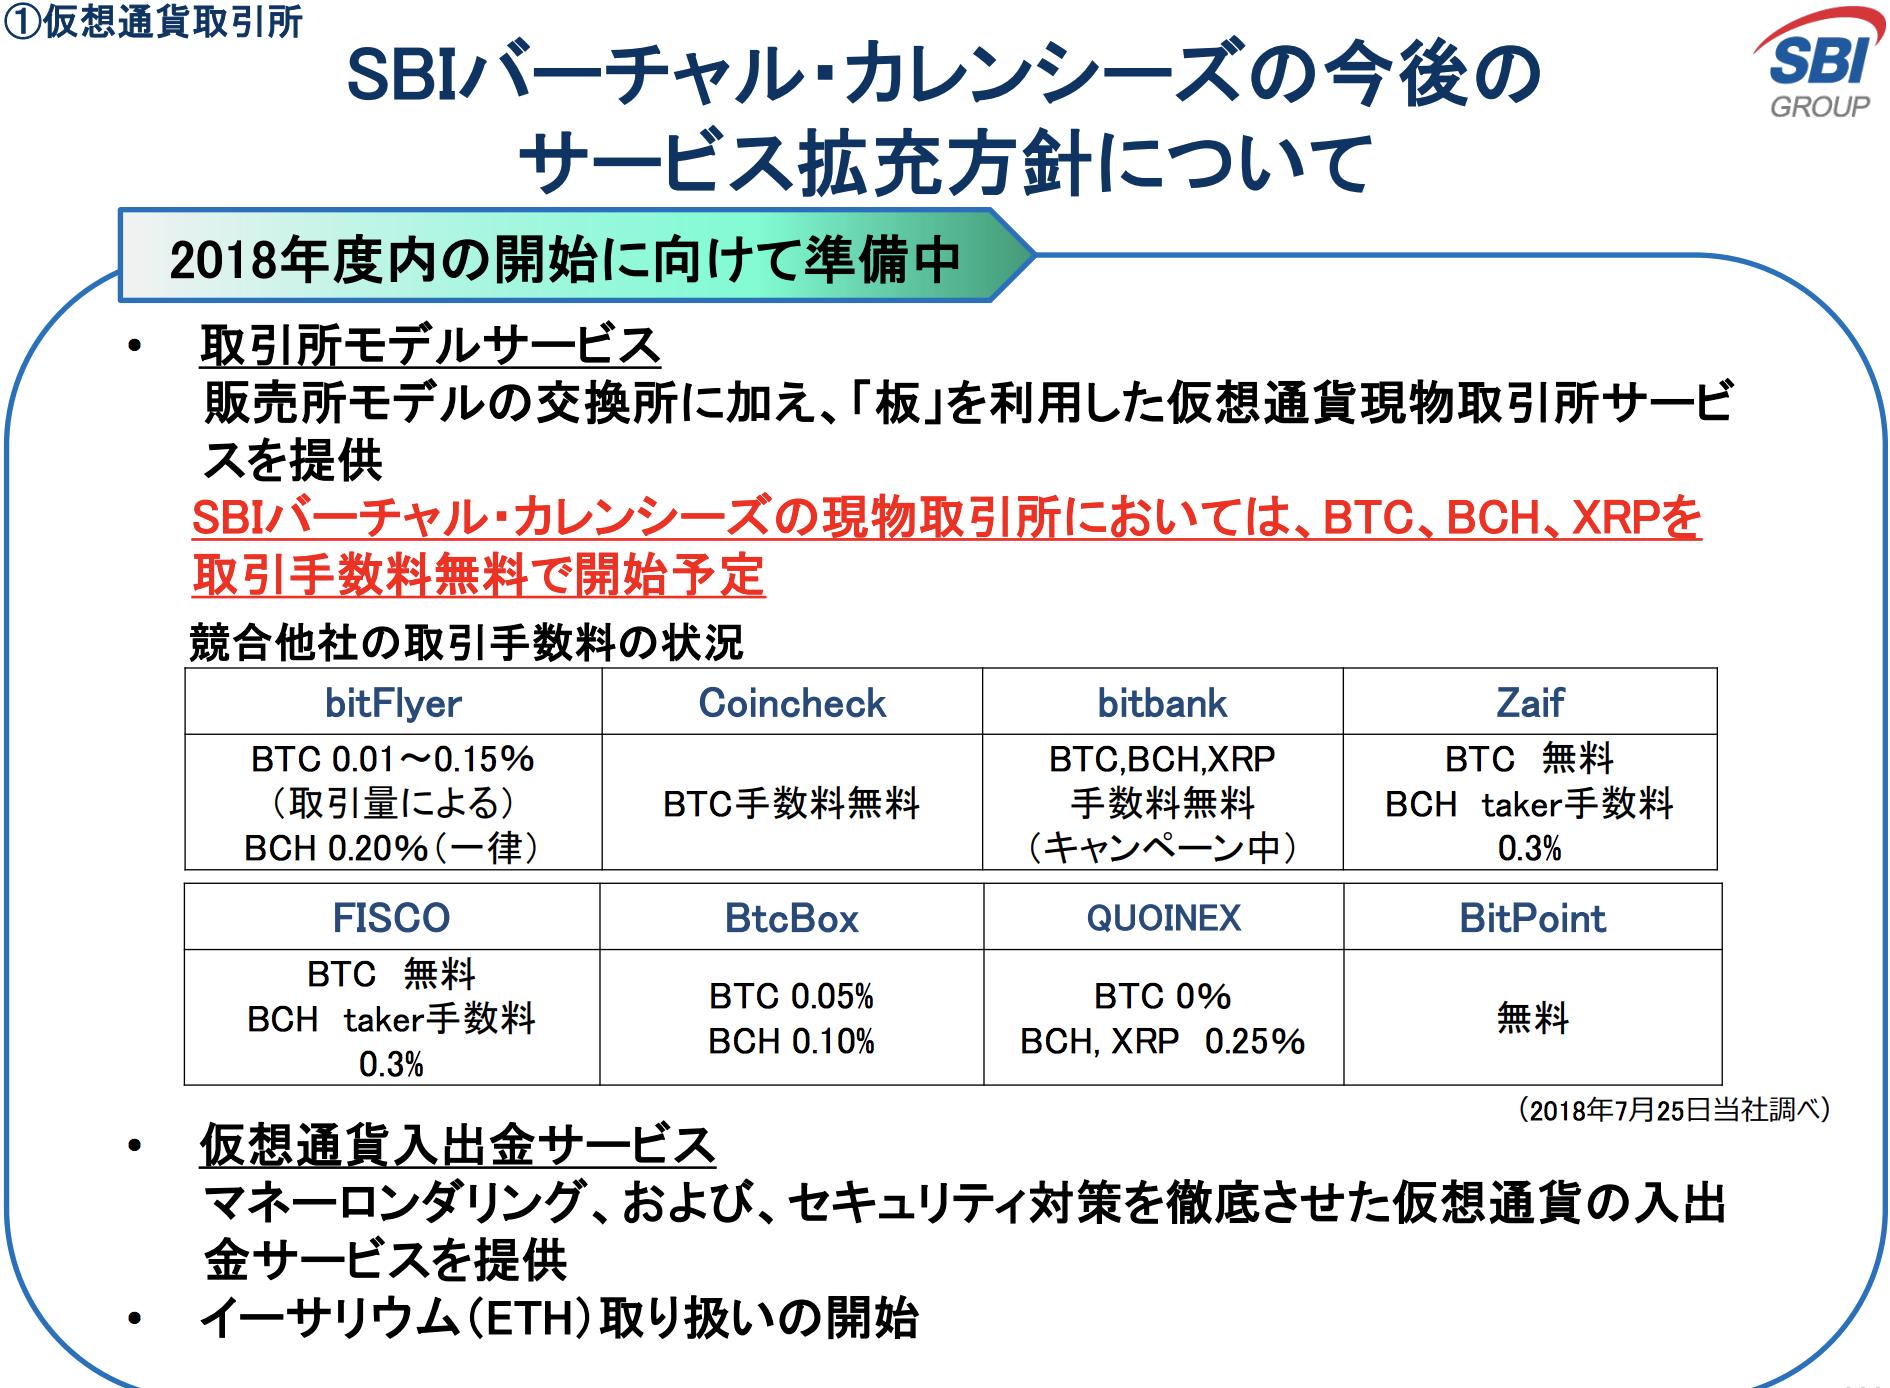 SBIバーチャル・カレンシーズ(SBIVC) 板取引 Ethereum(イーサリアム) 取り扱い 年度内 開始